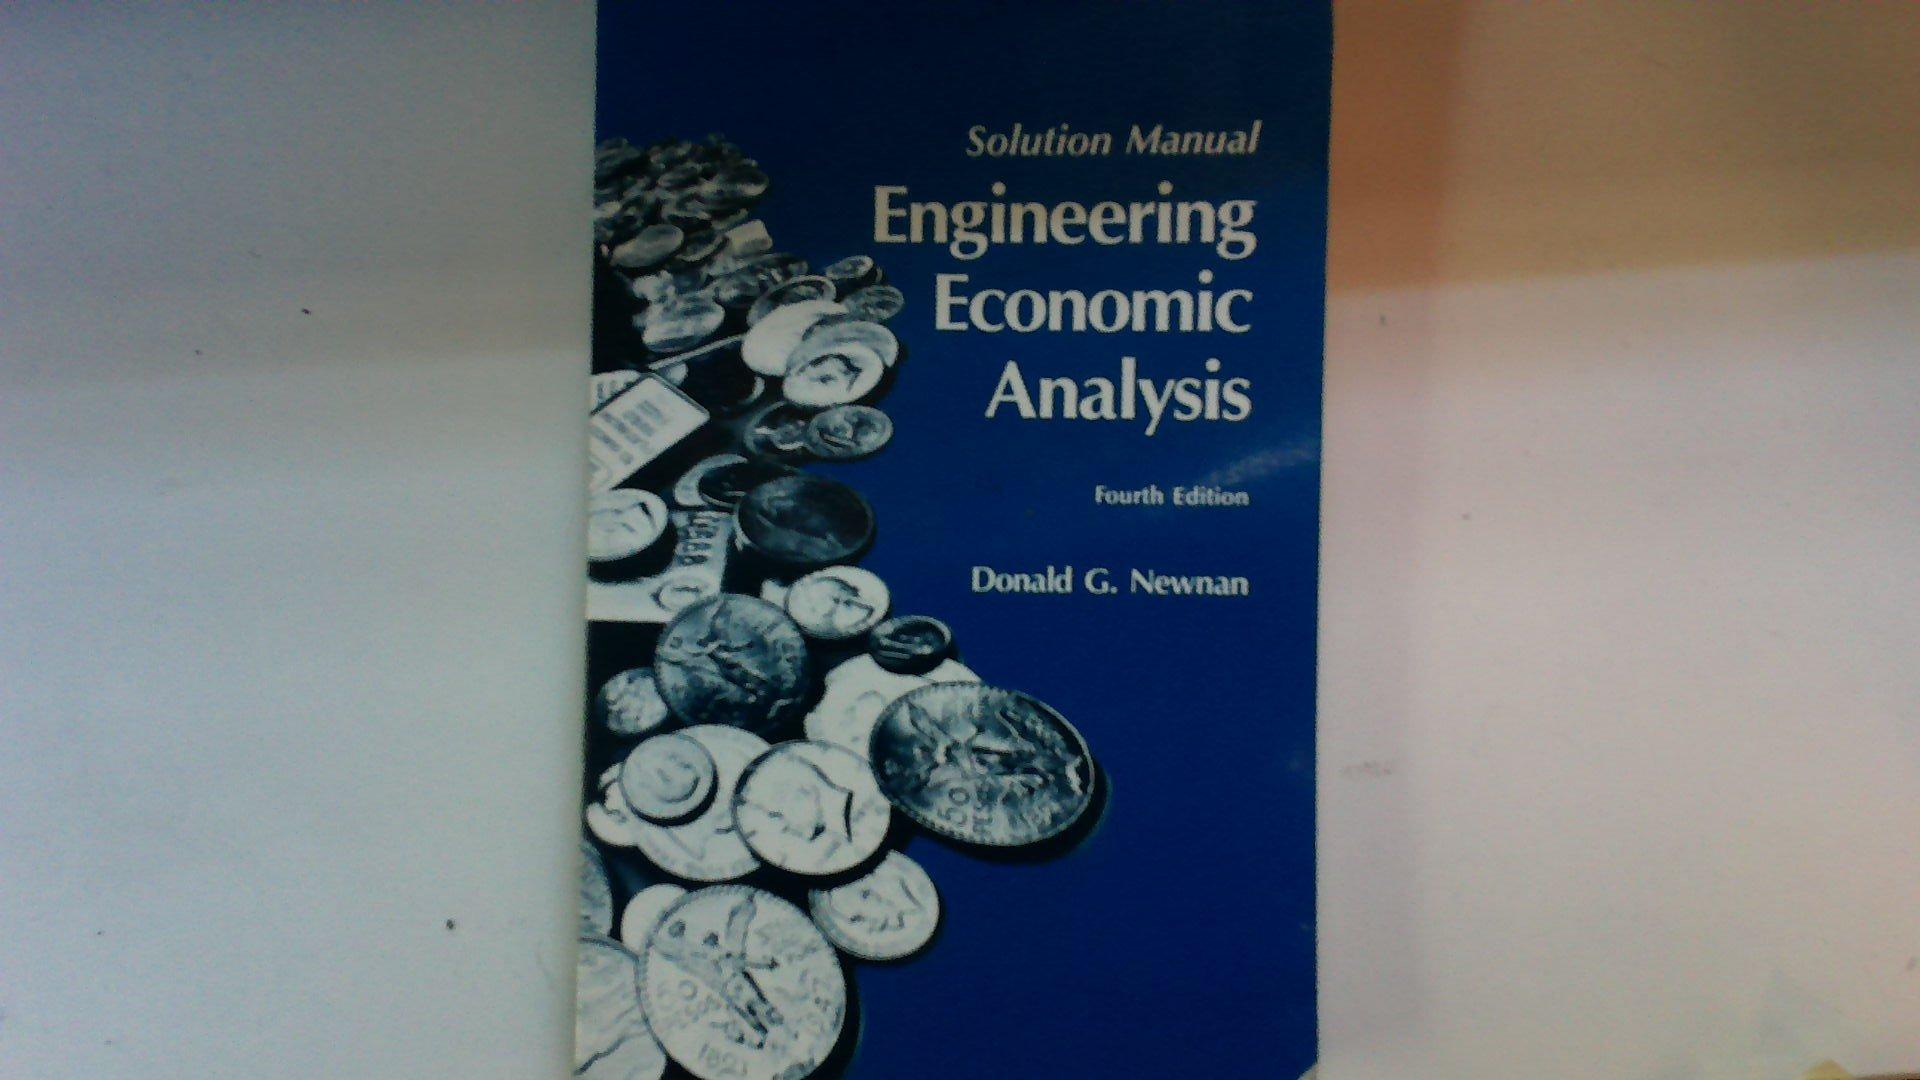 Engineering Economic Analysis: Solution Manual (Engineering Economic  Analysis: Solution Manual): Donald G. Newnan: 9780910554800: Amazon.com:  Books